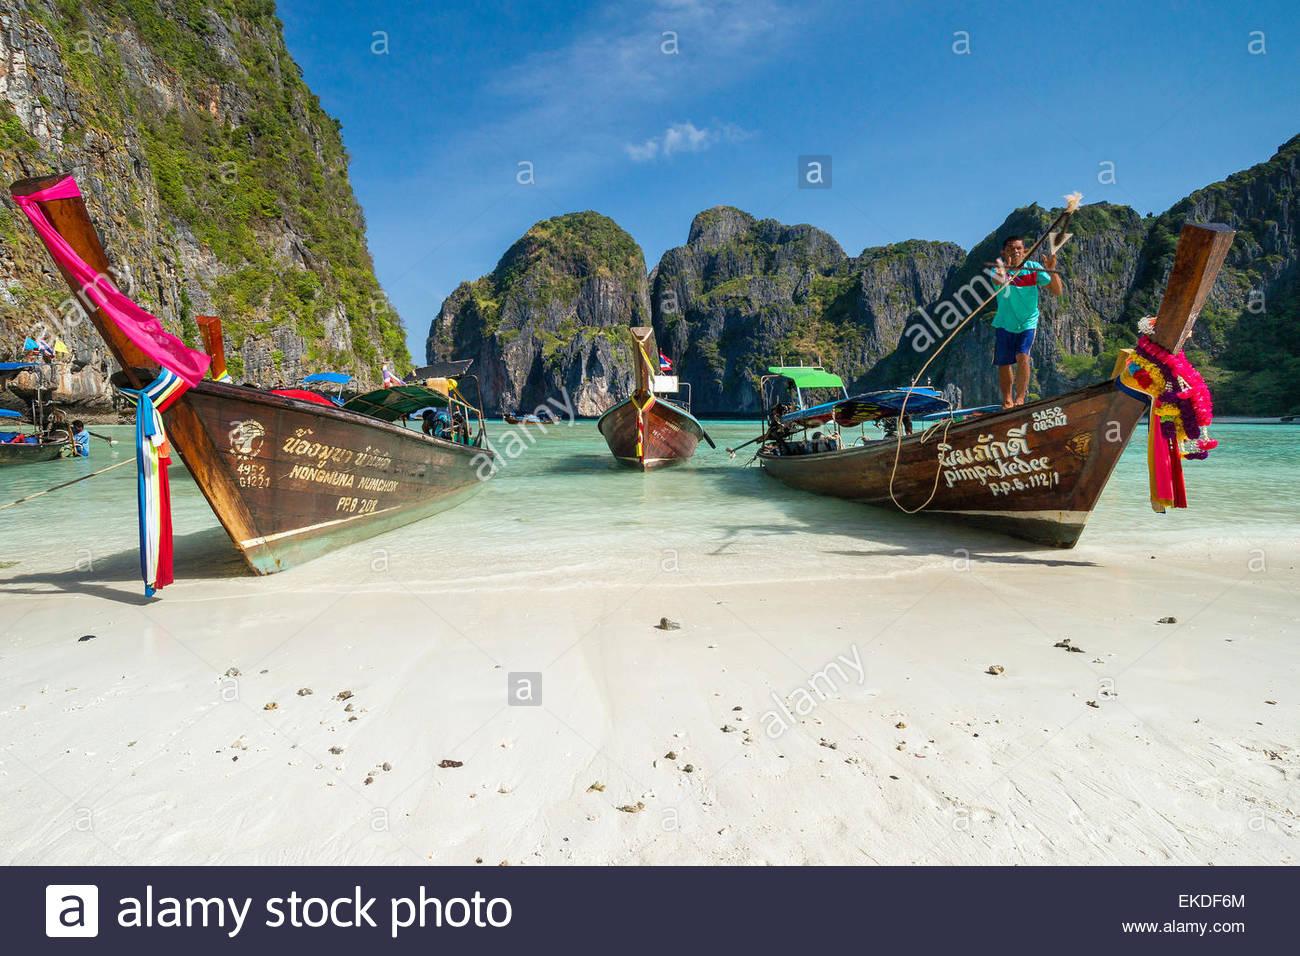 maya-bay-koh-phi-phi-ley-island-thailand